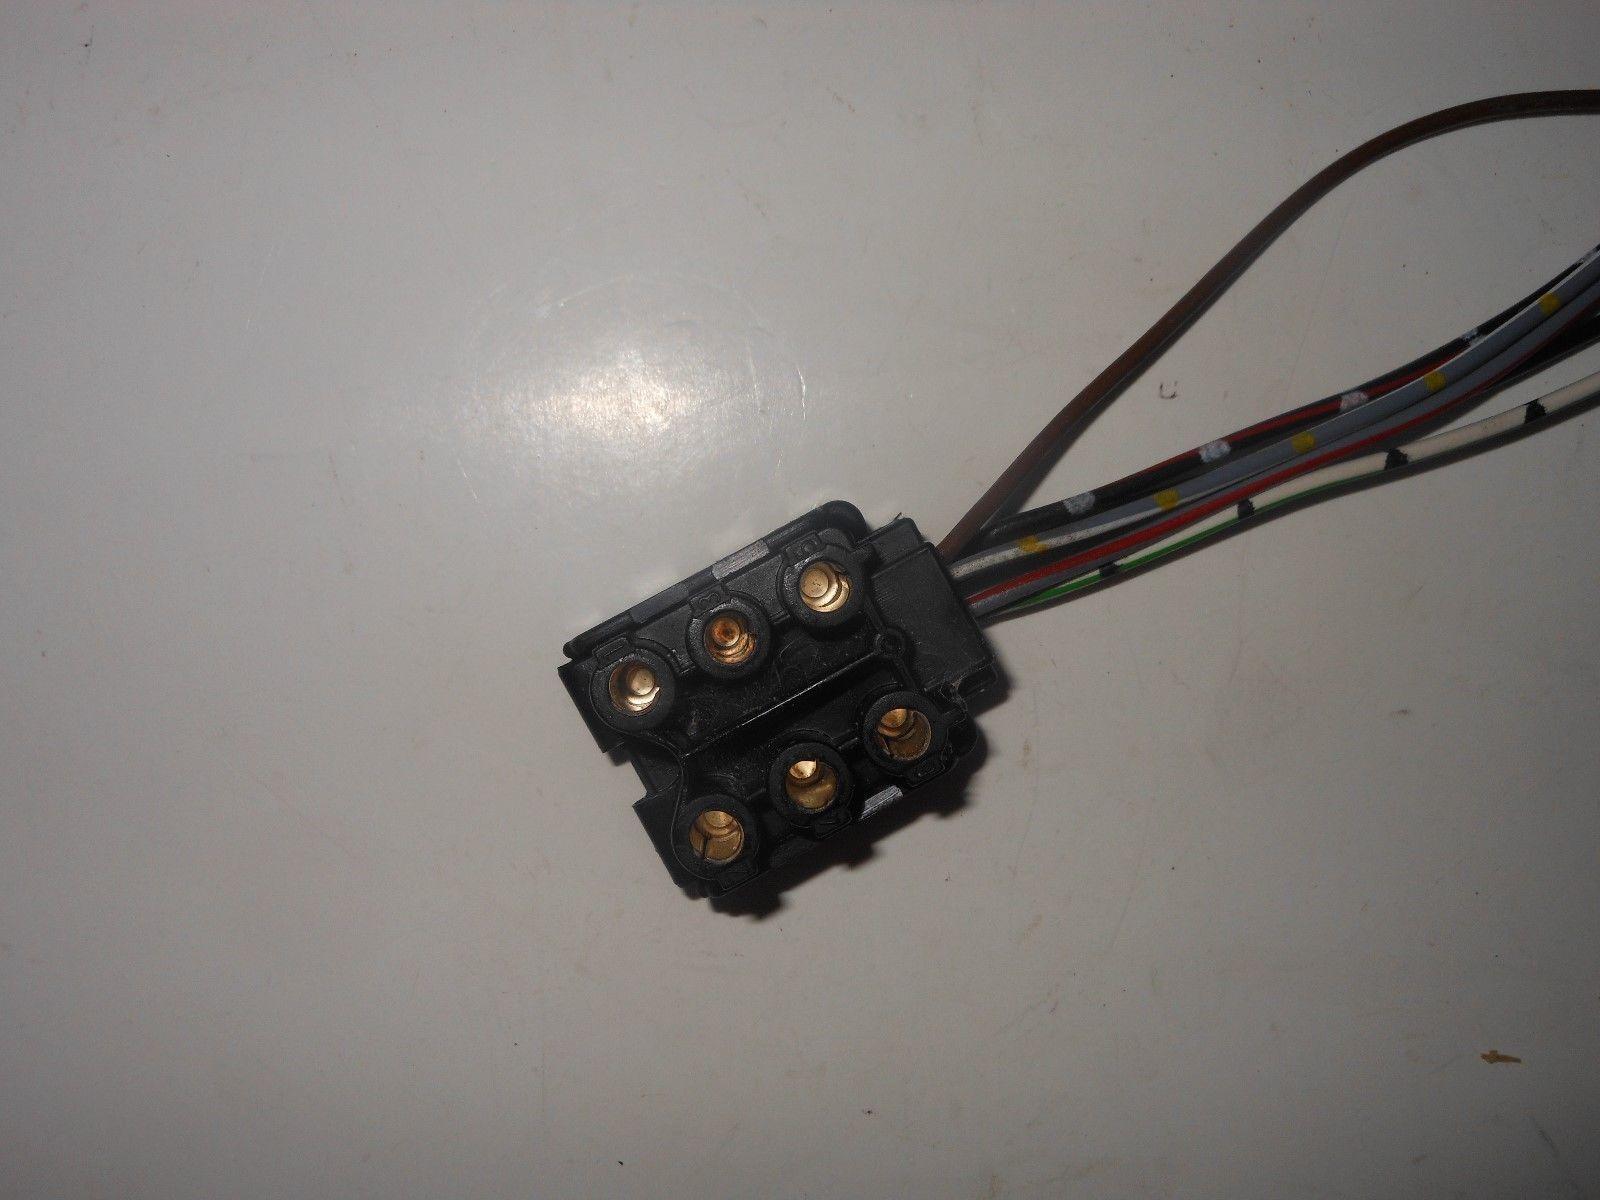 mercedes 1986 1993 w124 300e 300d 260e tail light wiring harness pigtail plug 124 [ 1600 x 1200 Pixel ]